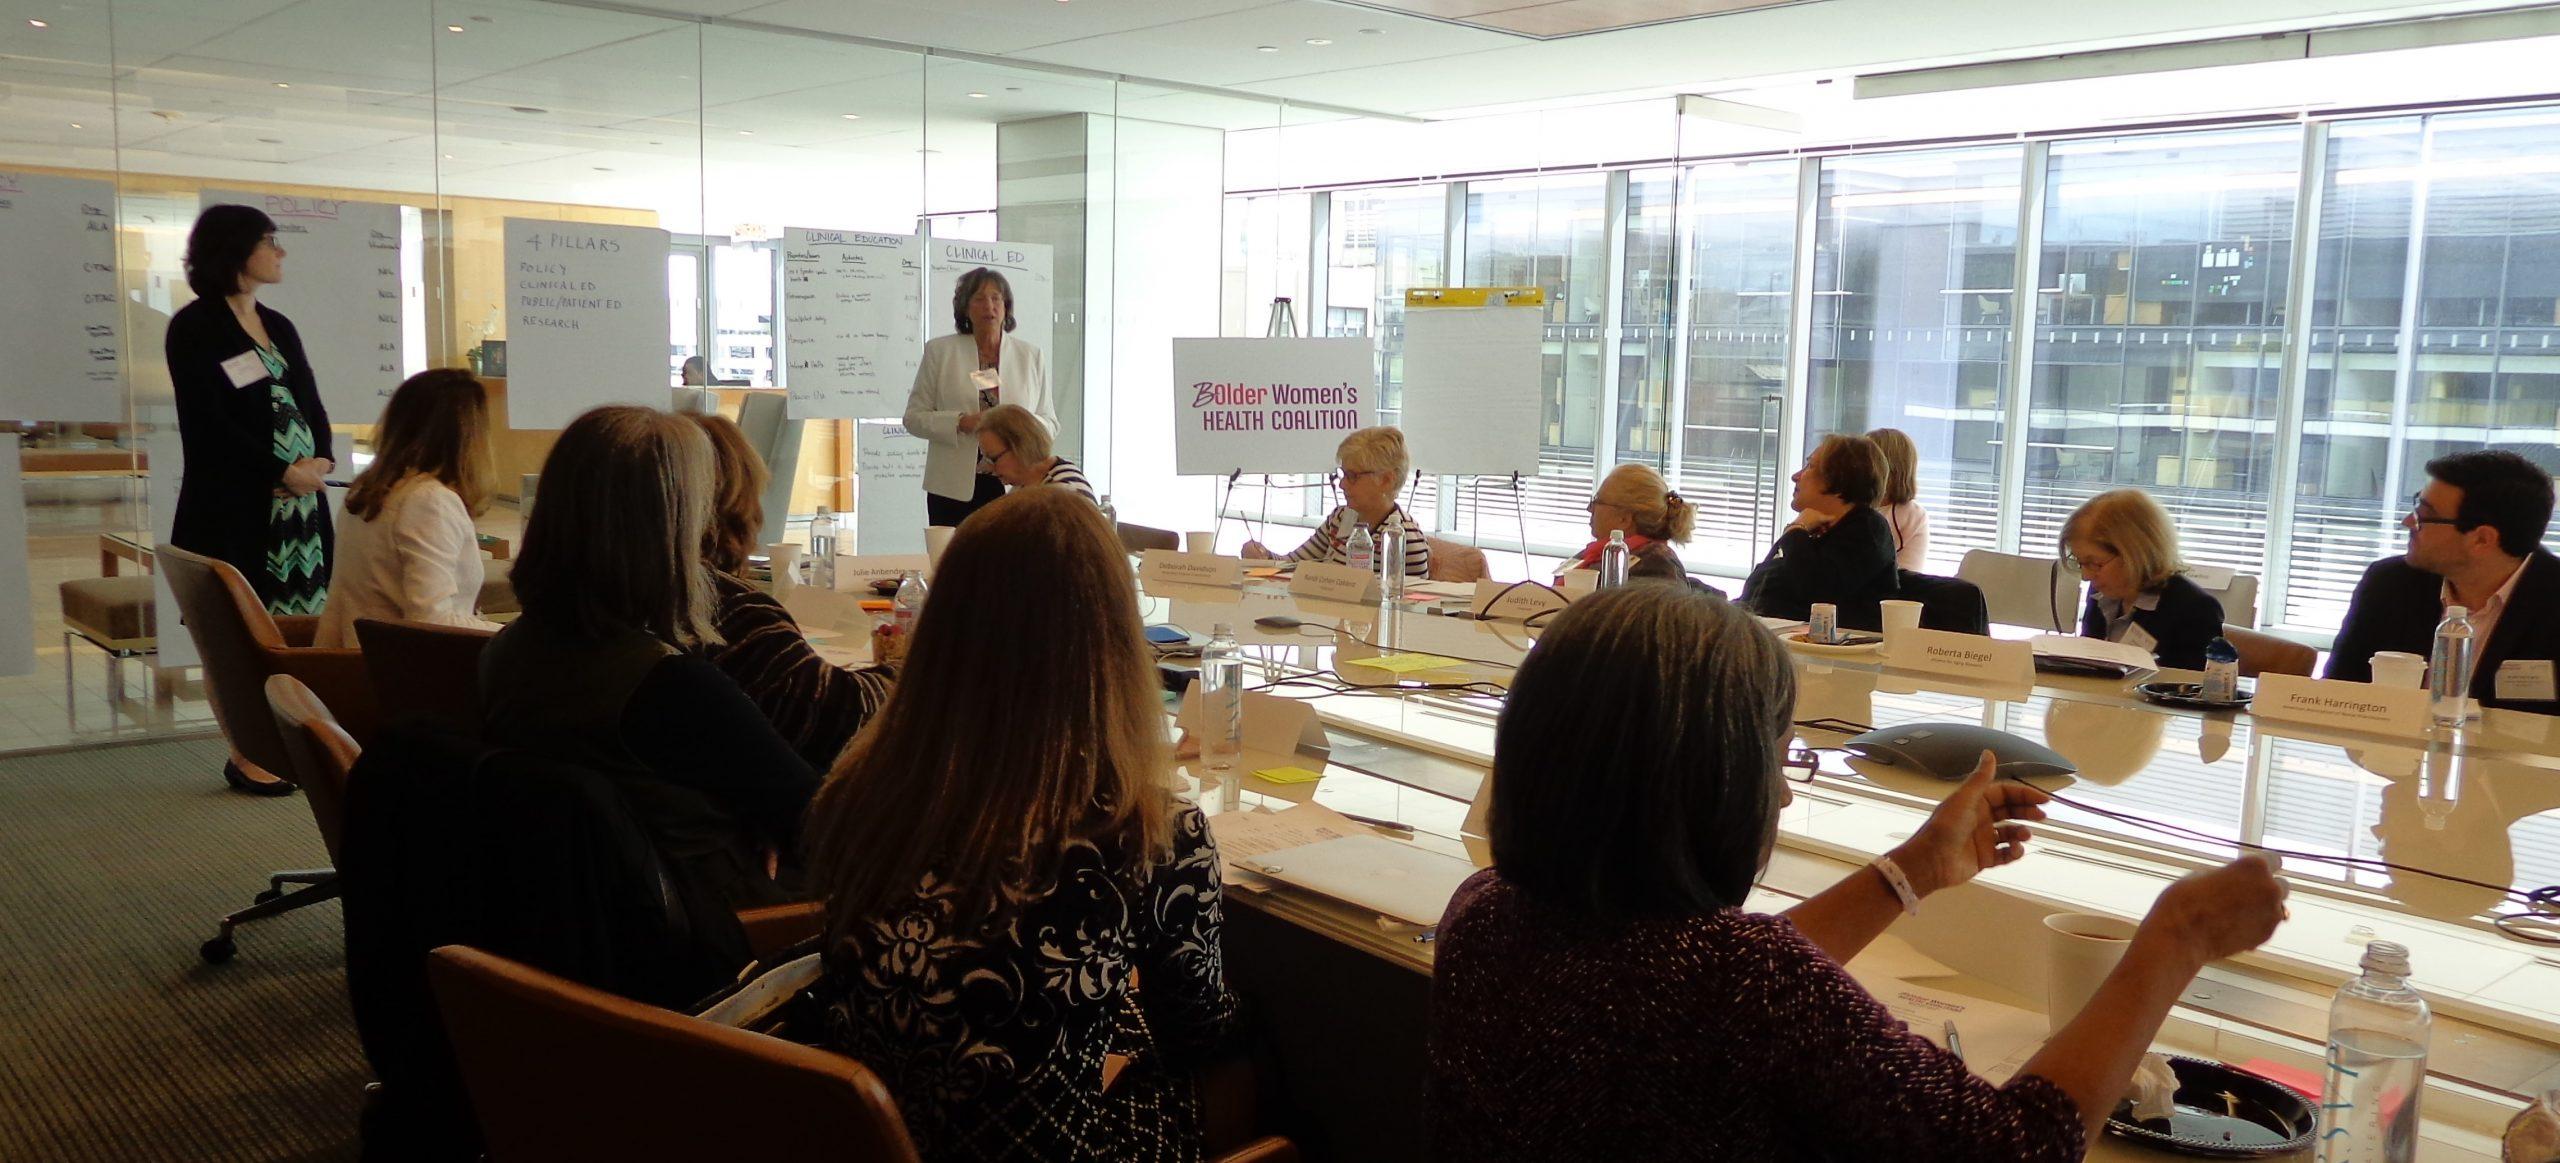 BOlder Women's Health Coalition